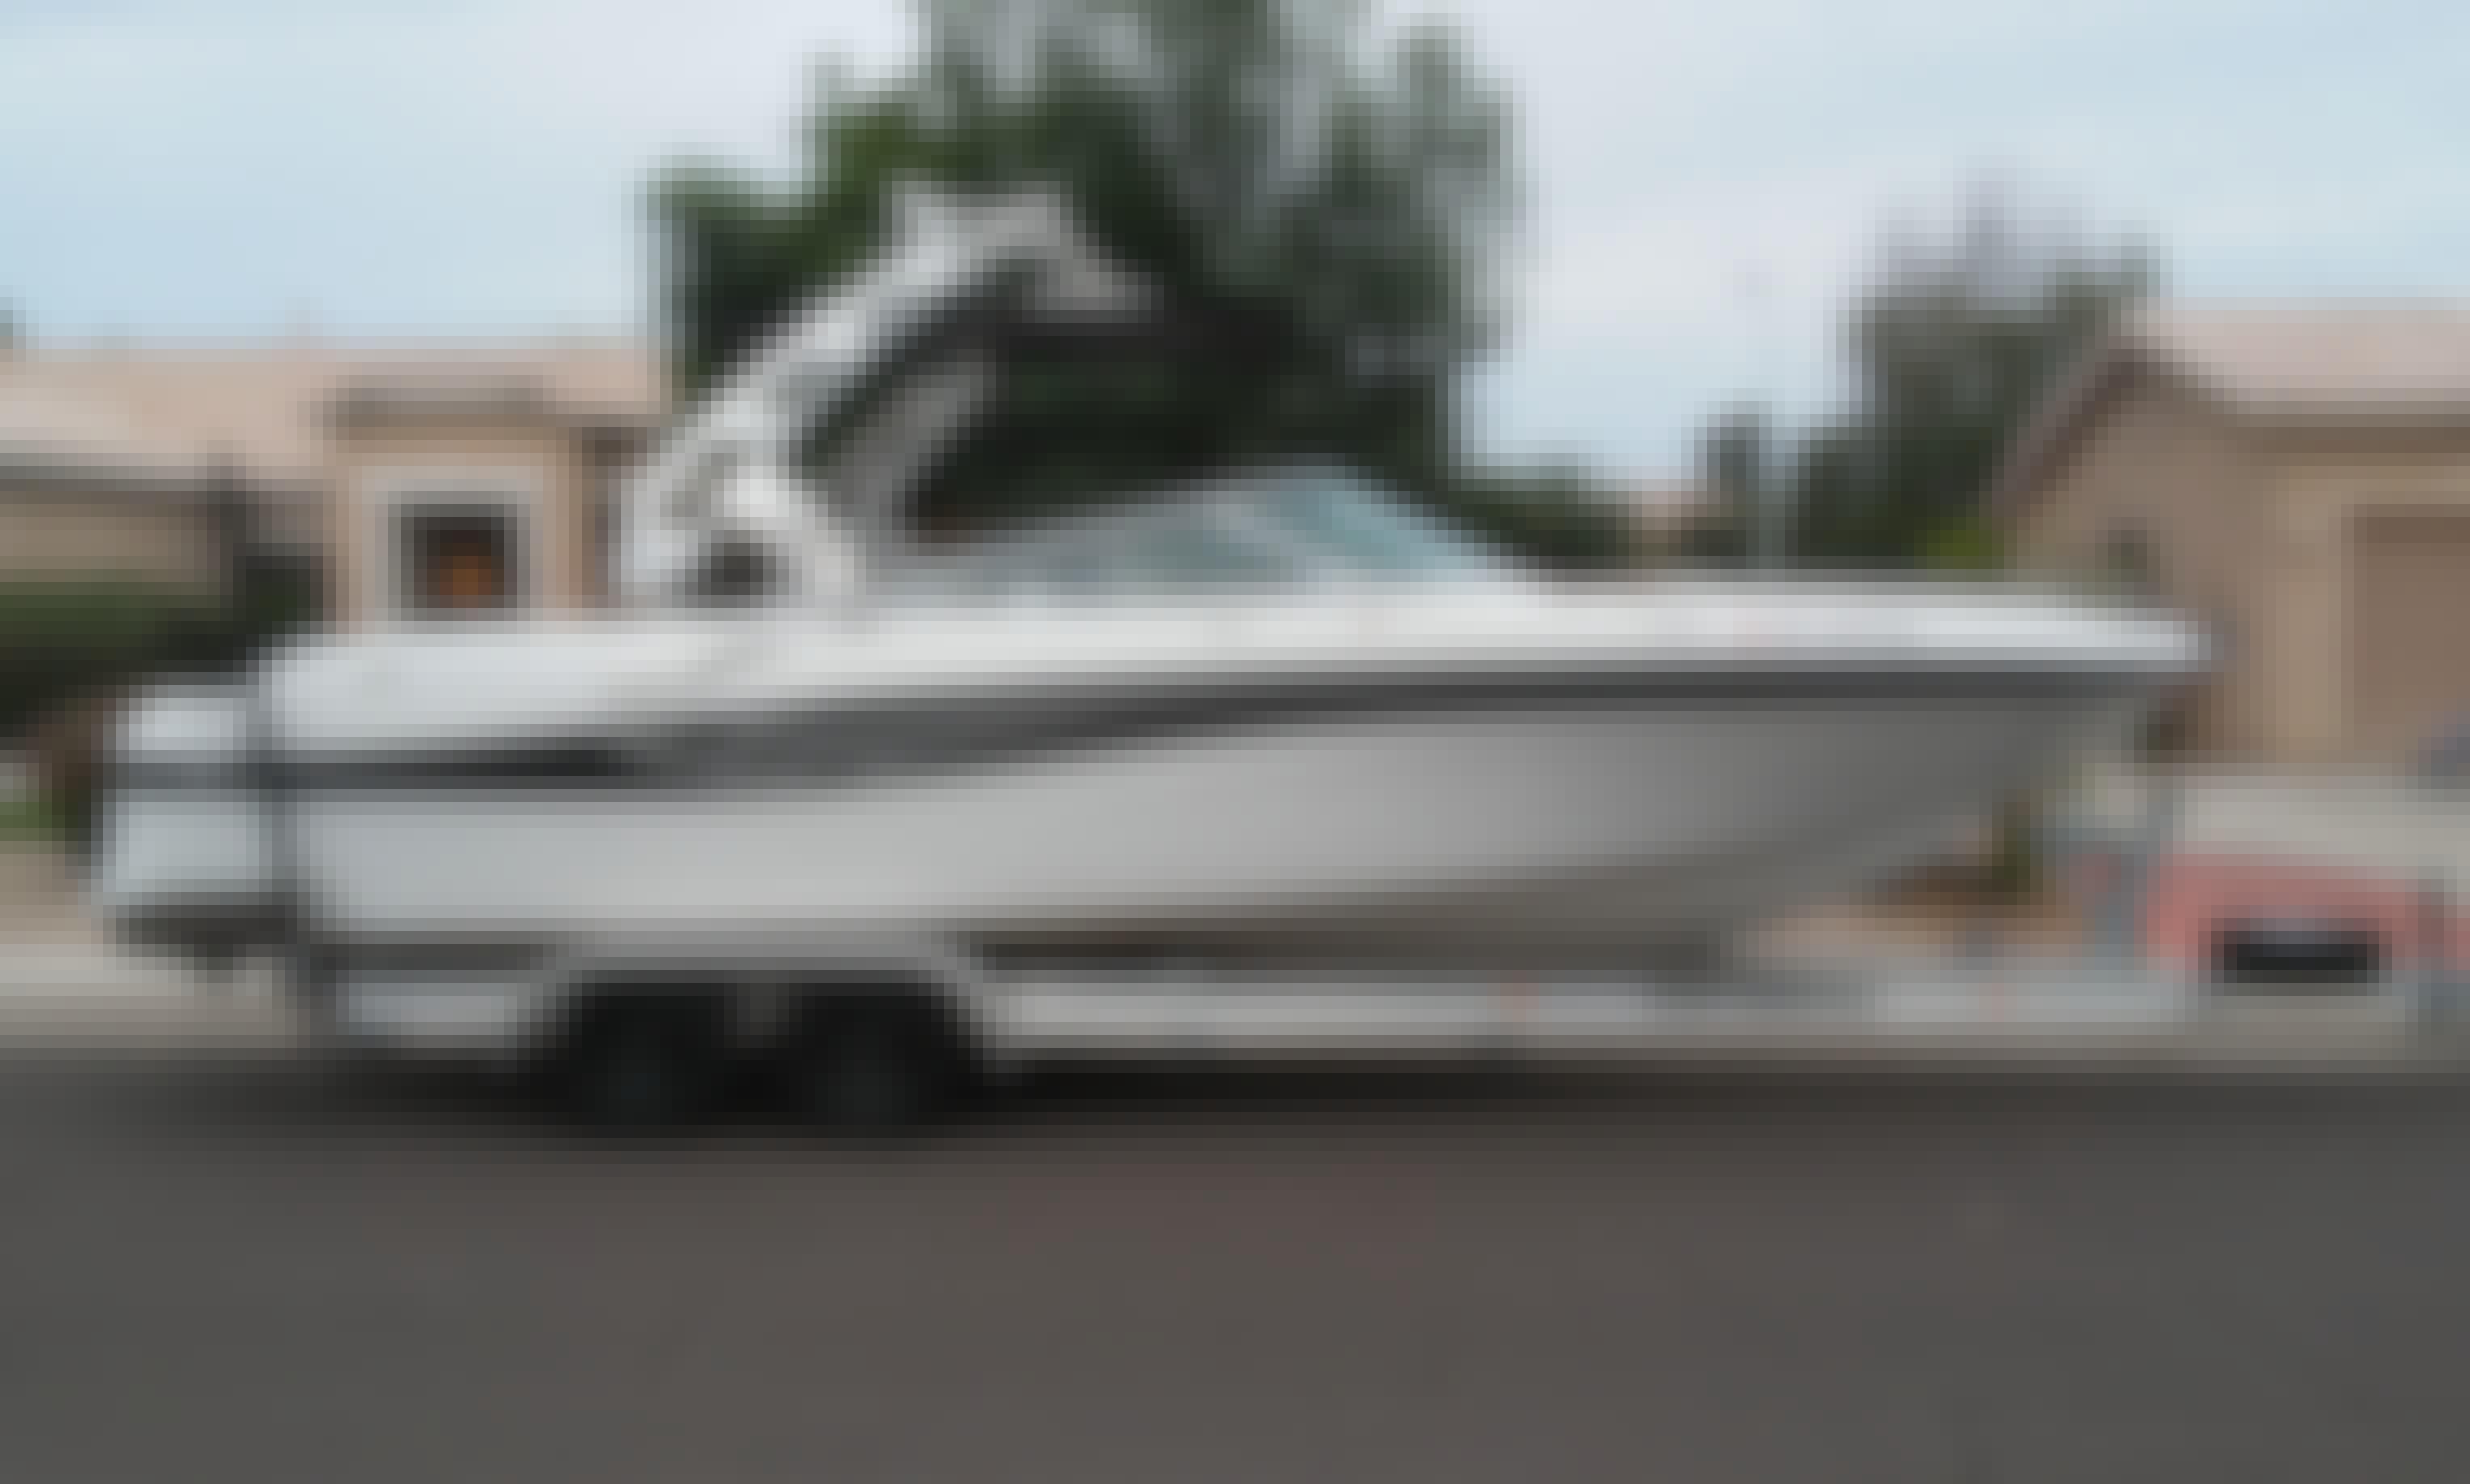 26' Fourwinns Ski Boat for 11 Thrill Seeker in Fort McDowell, Arizona